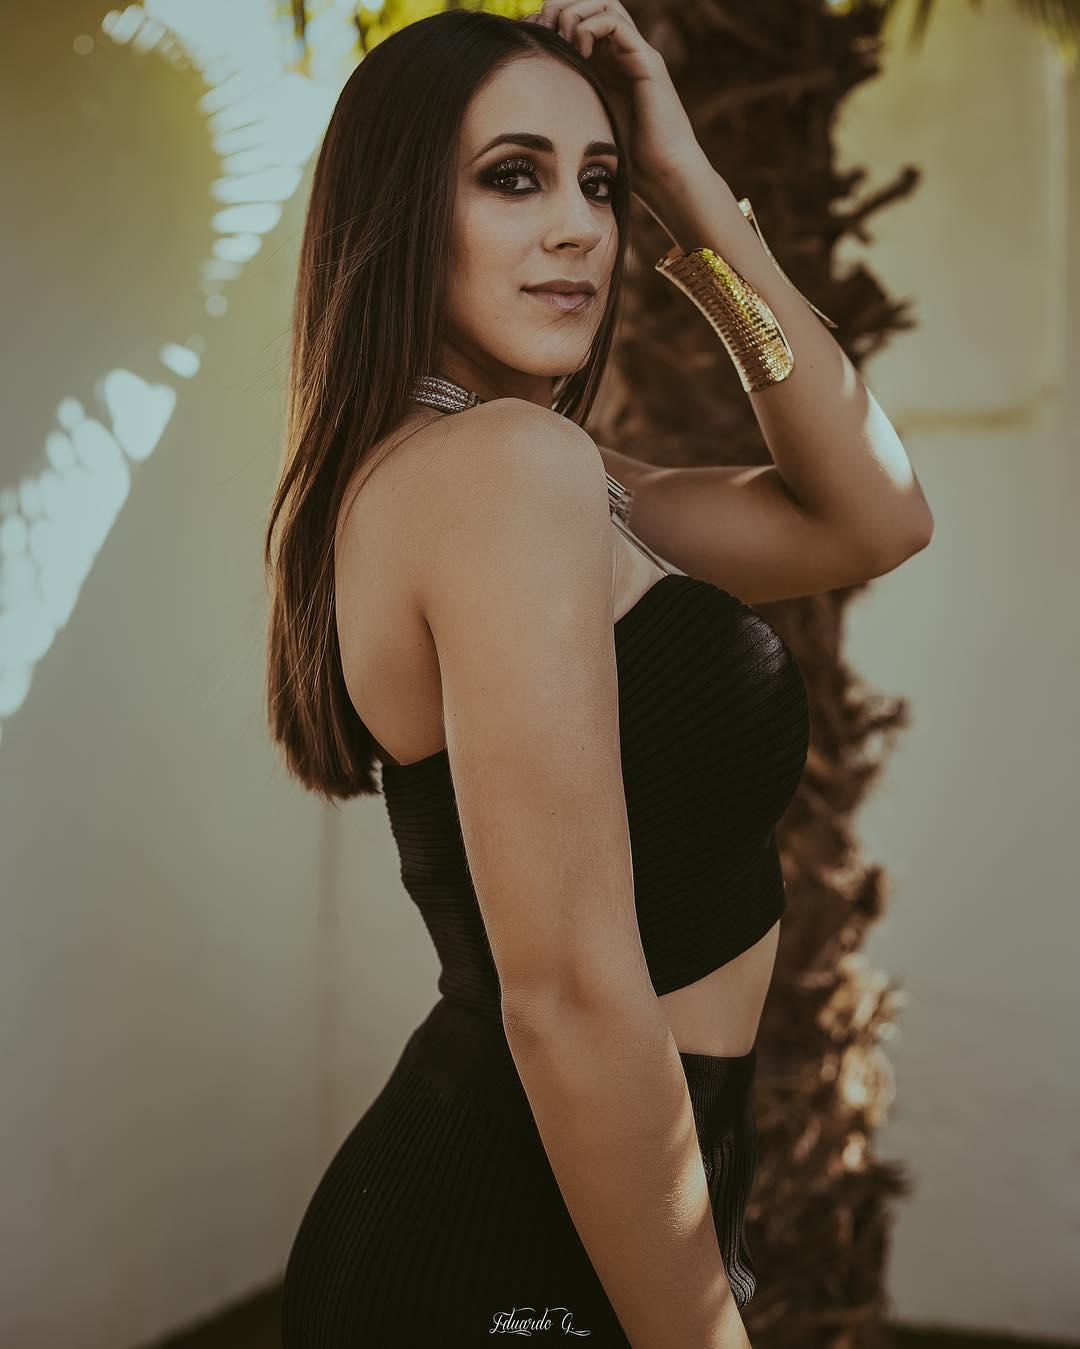 melissa danda, miss eco mexico 2019. 52696210